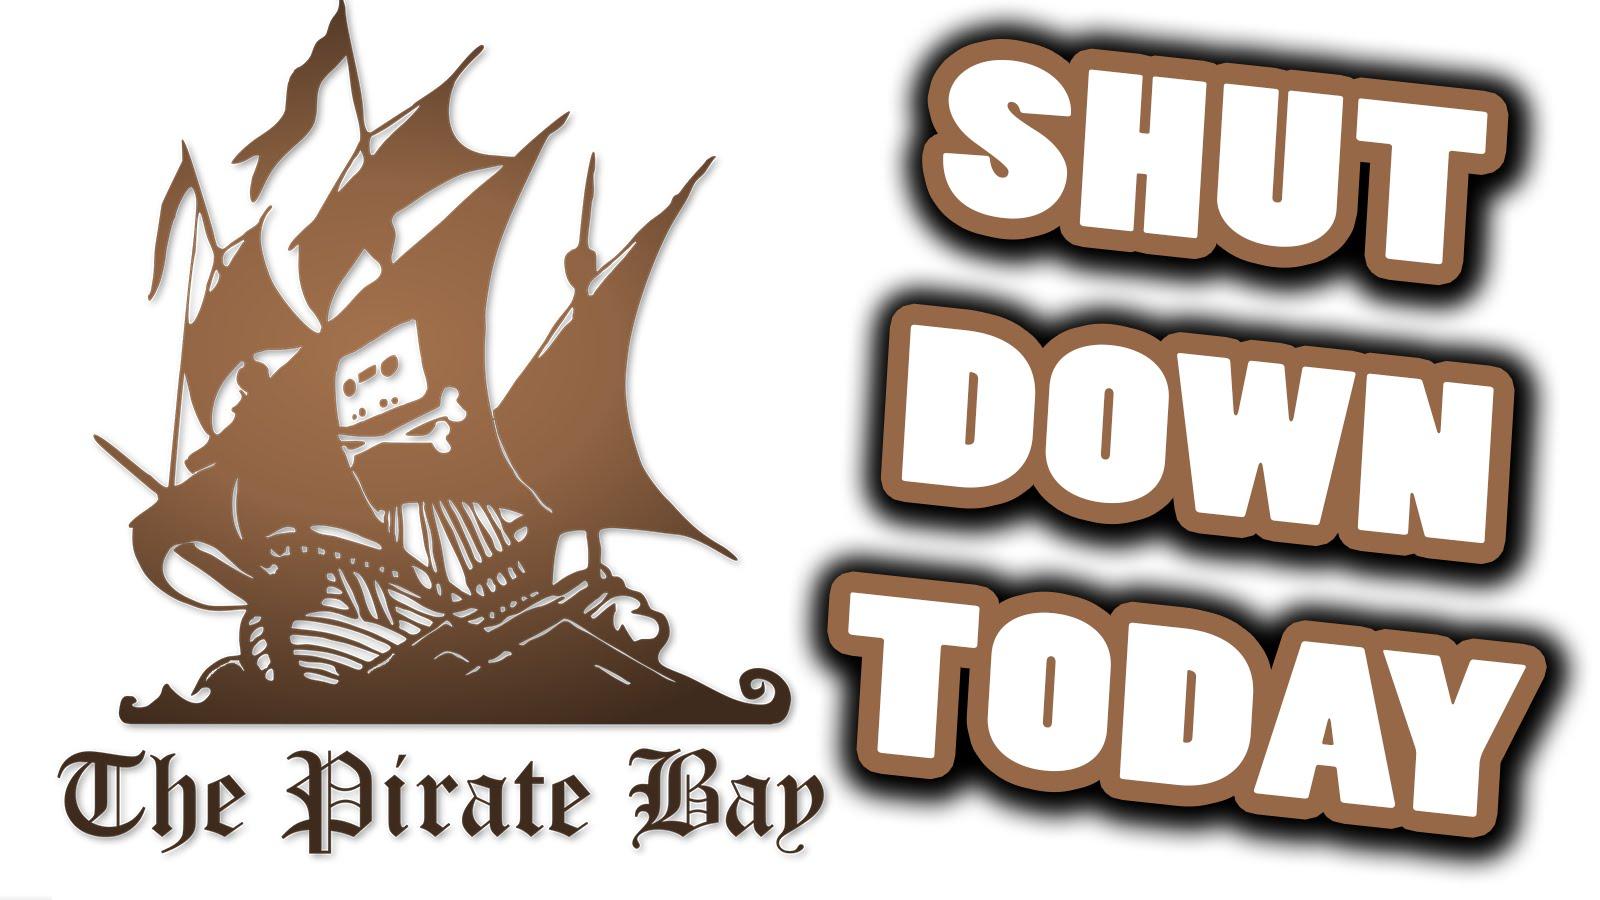 pirate bay down alternatives